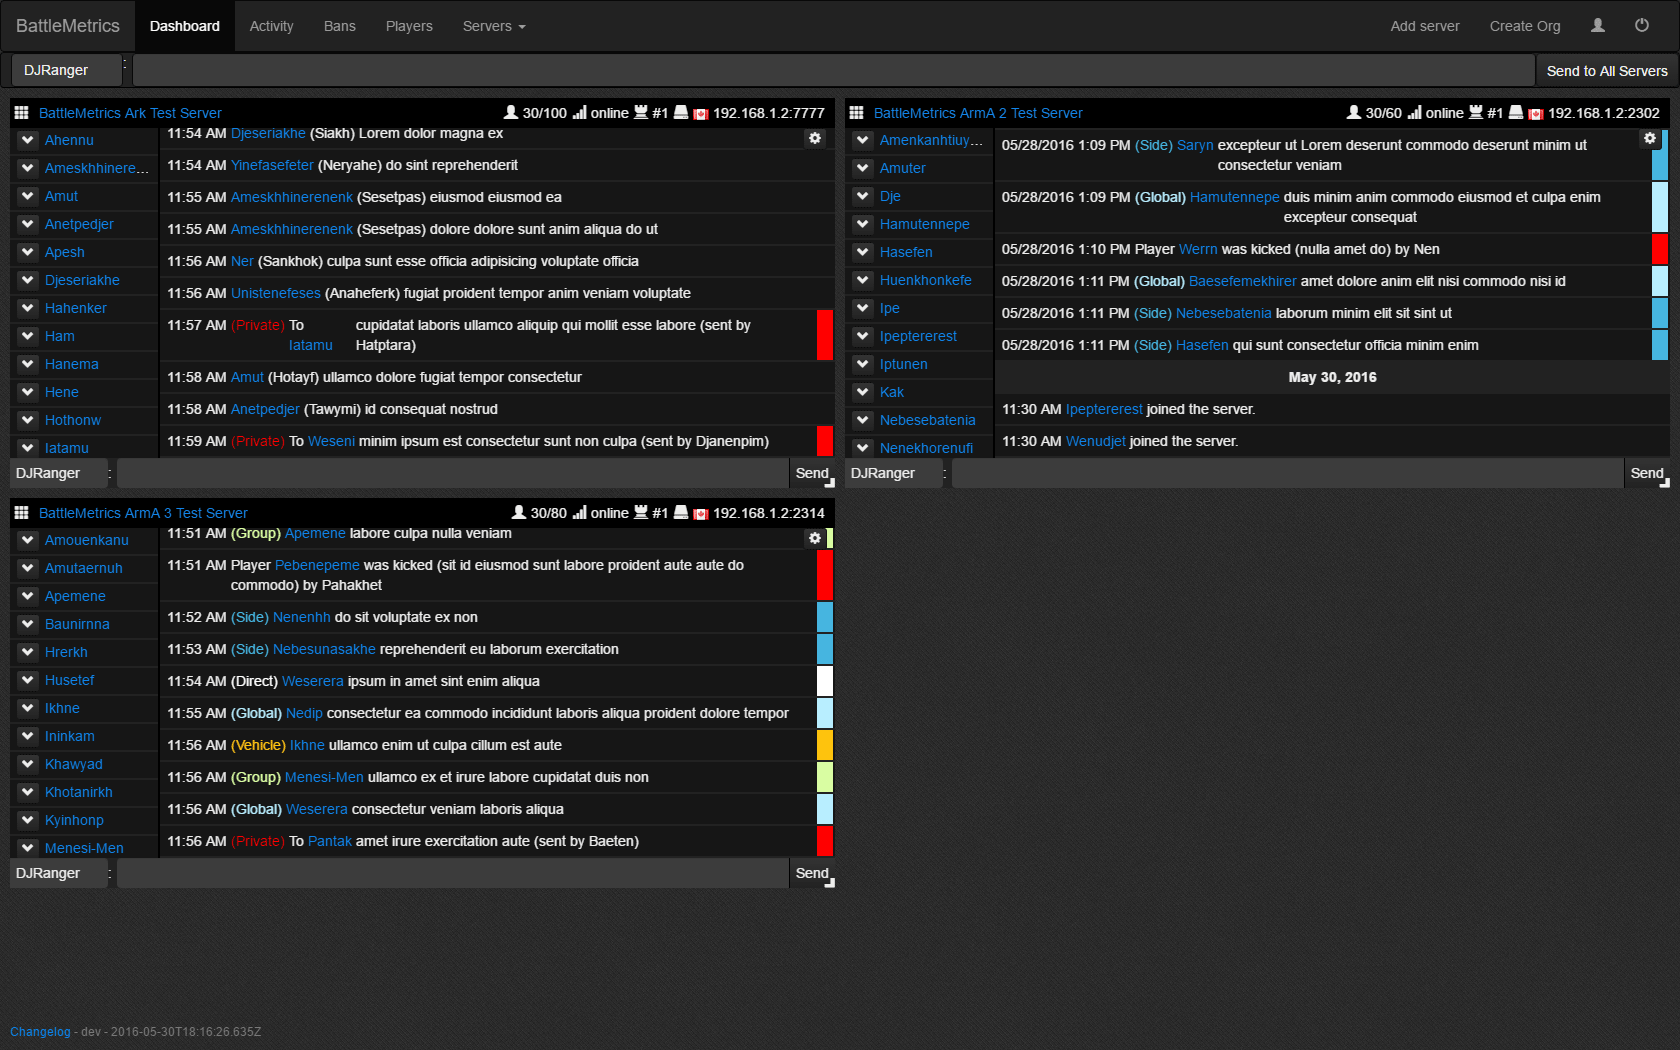 BattleMetrics Web-Based RCON Tool- Ban Sync, Detailed Logs